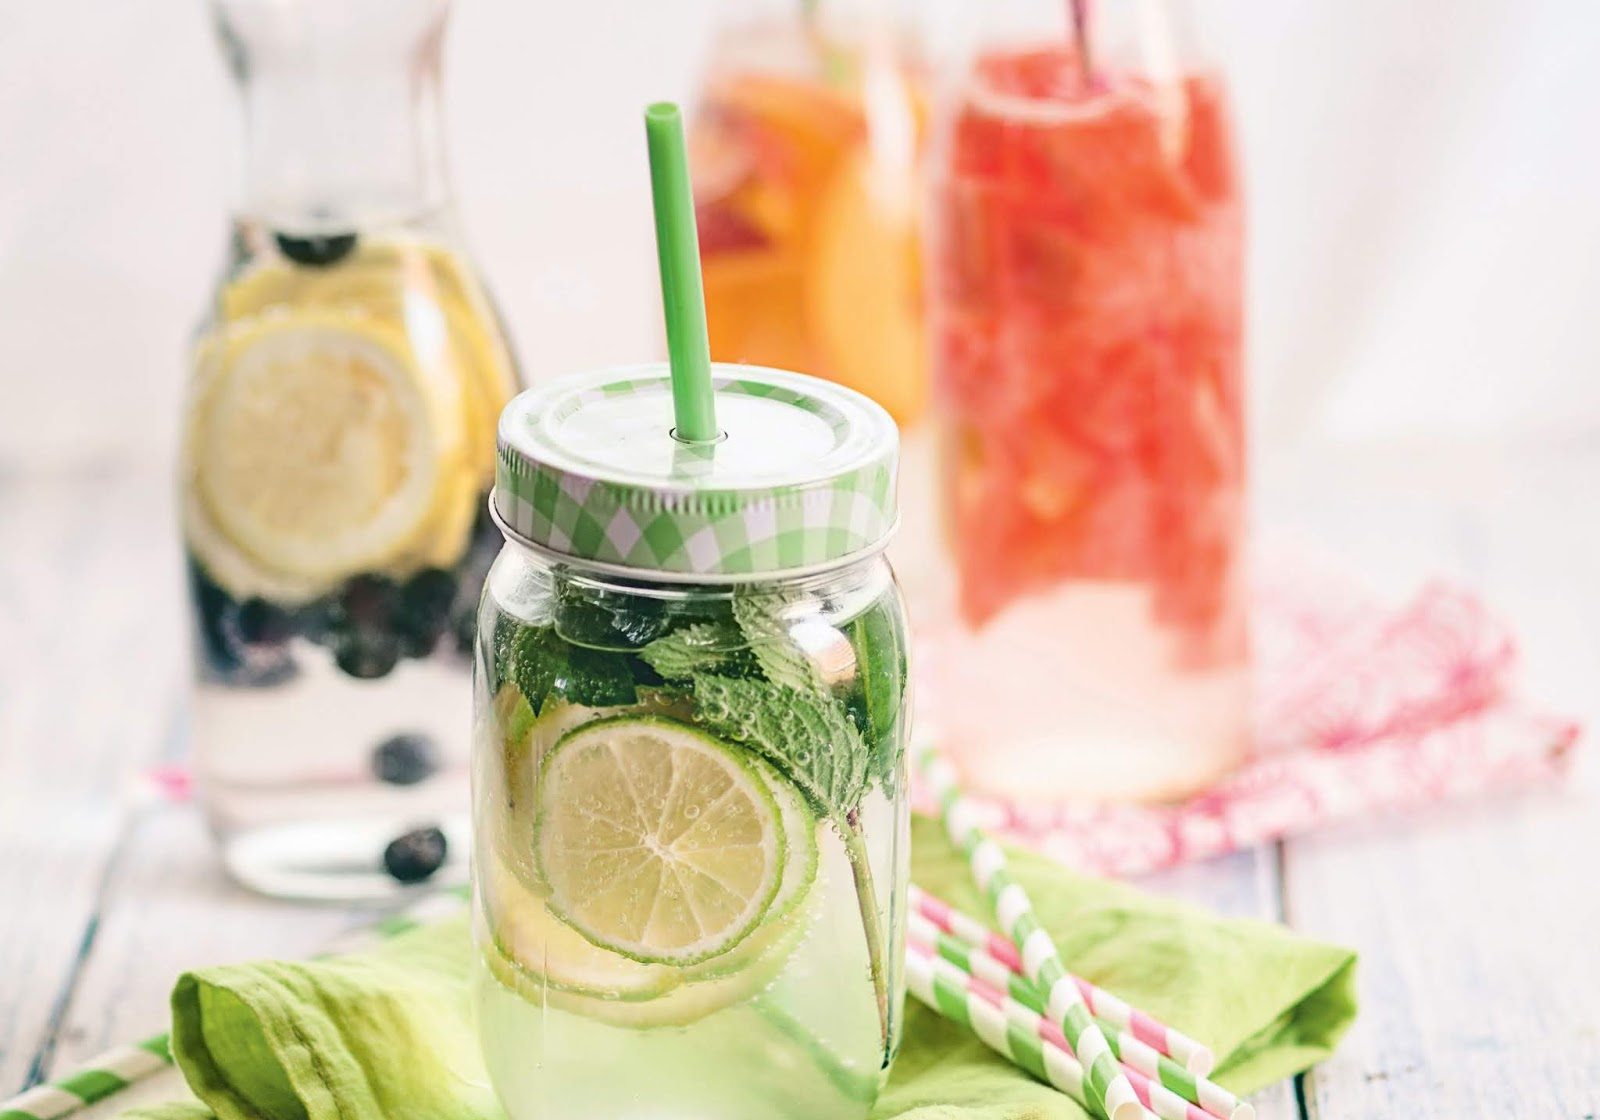 Água Sass - receita simples para hidratar